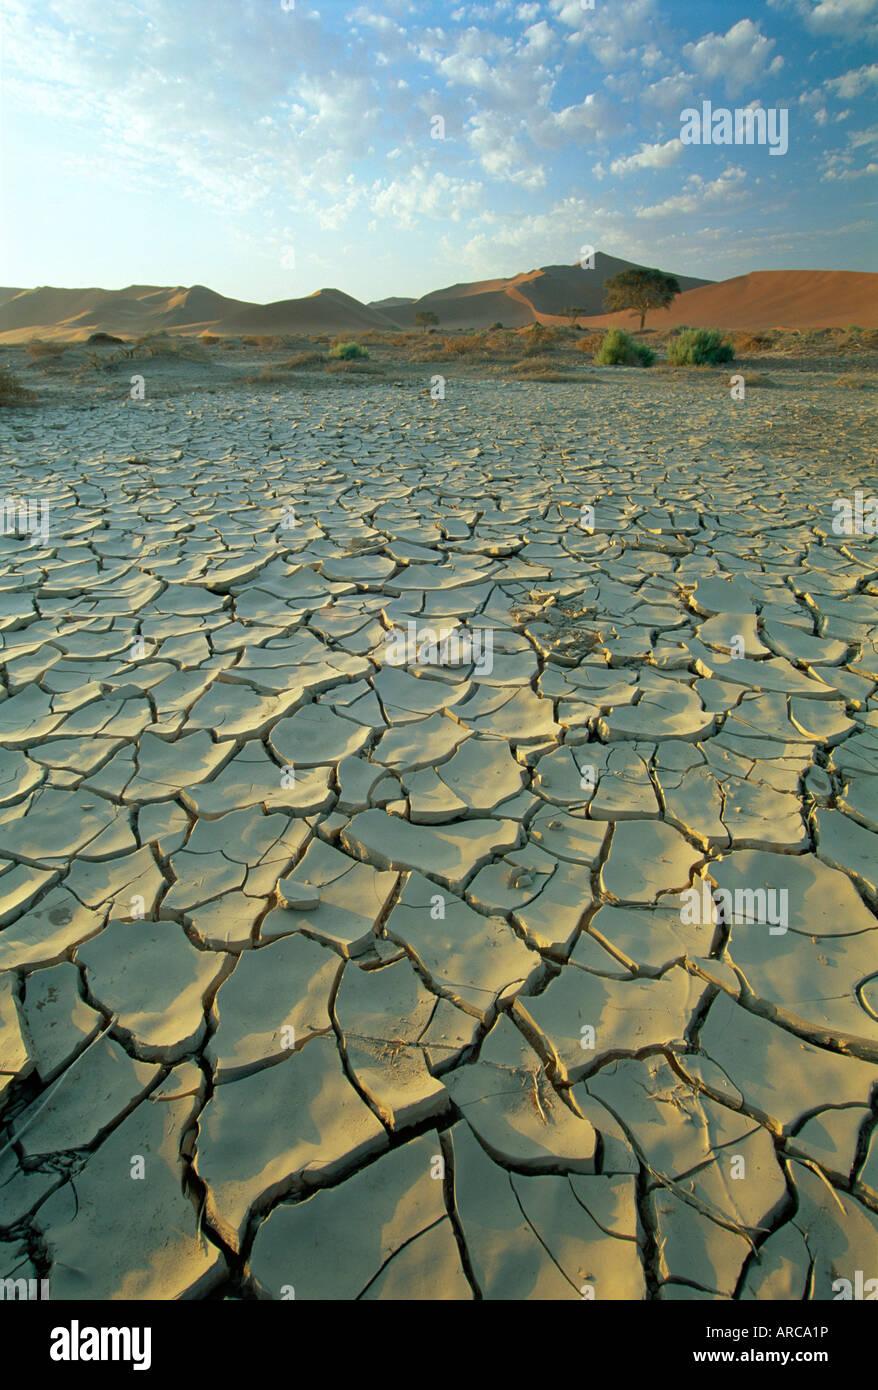 Sunbaked mud pan/cracked earth, near Sossusvlei, Namib Naukluft Park, Namibia, Africa - Stock Image